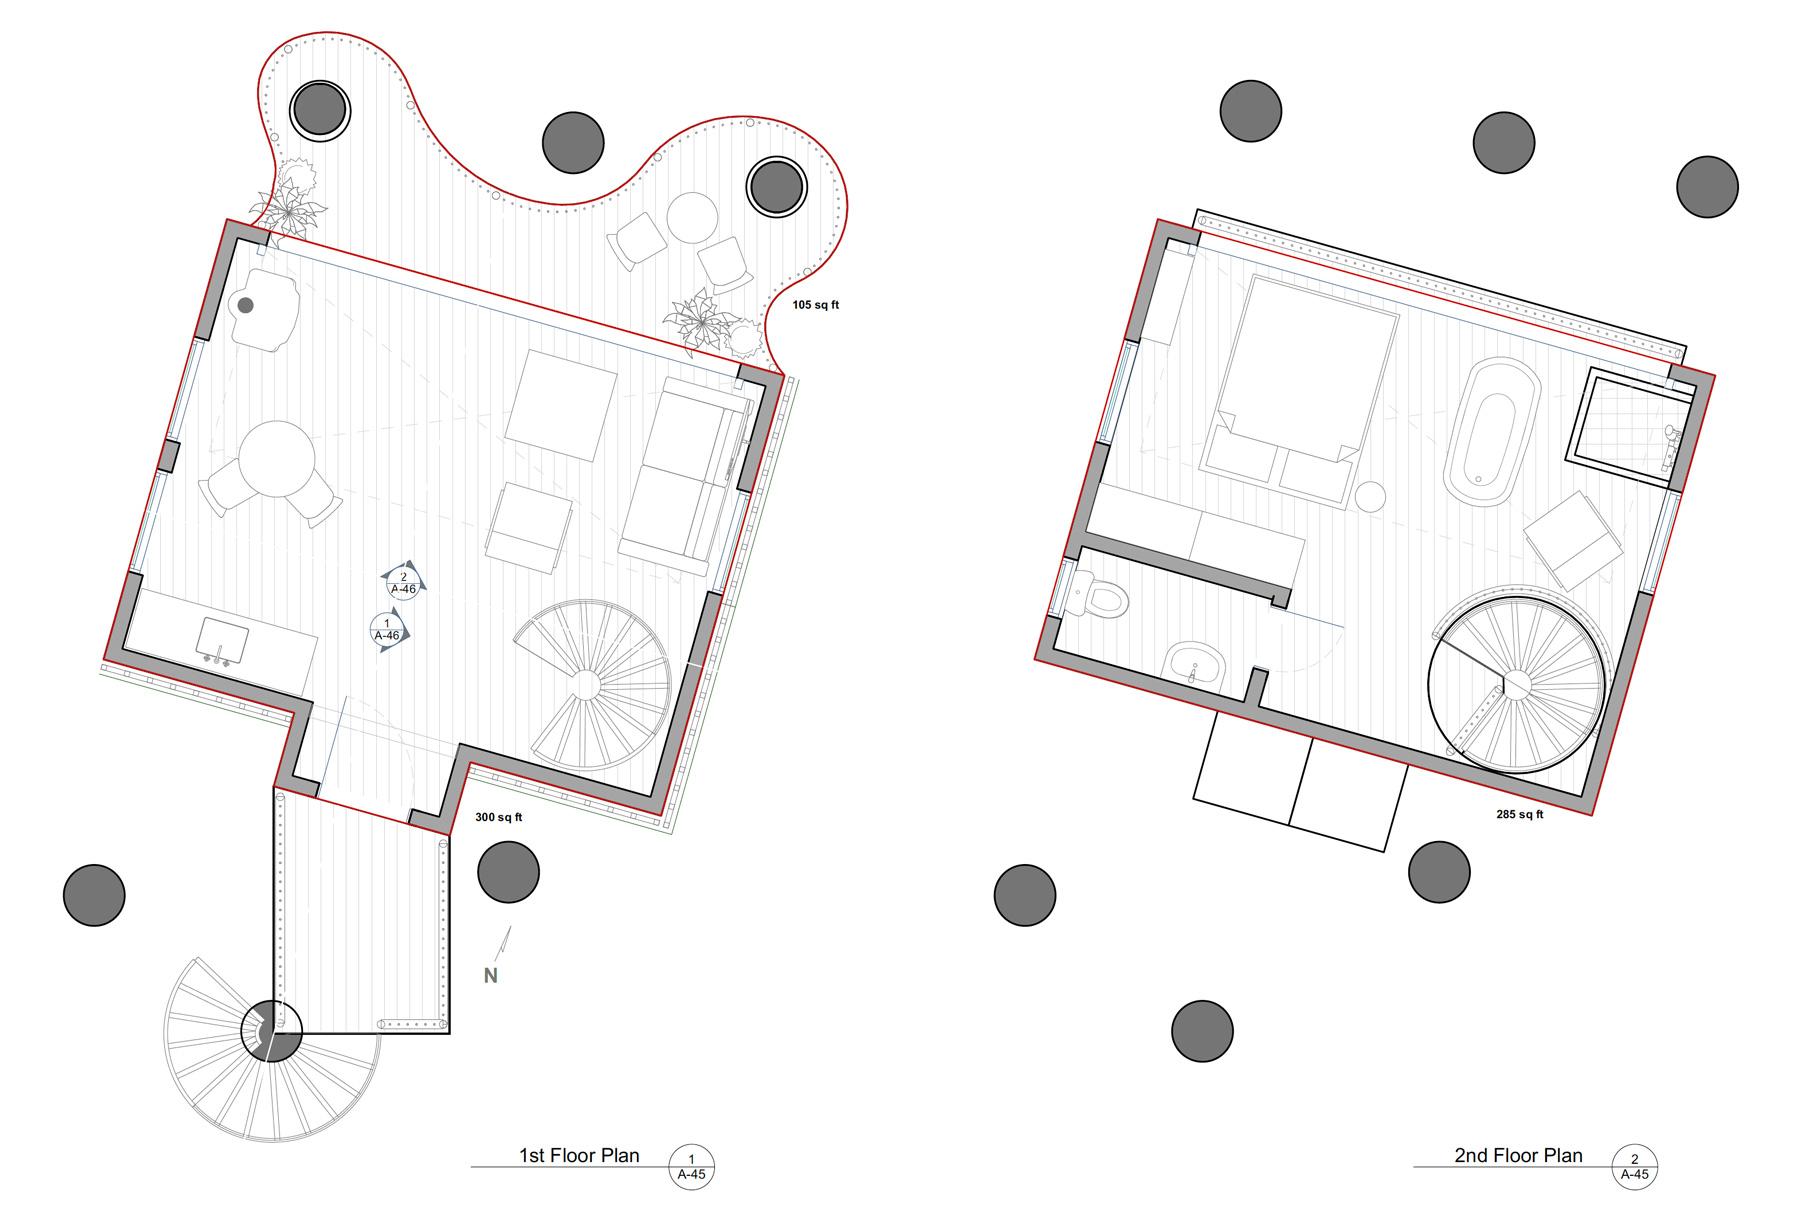 OPTION 2: 1st & 2nd FLOOR PLANS